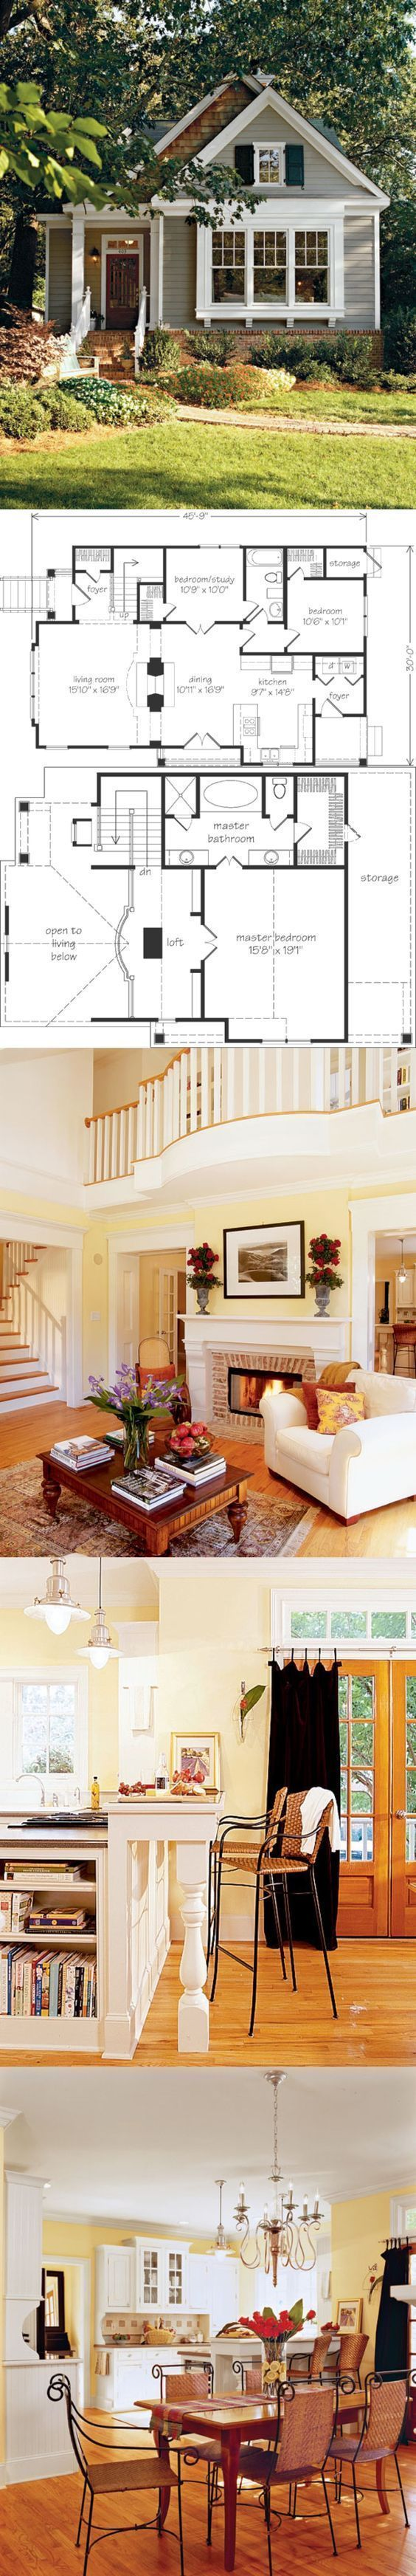 Beautiful Small House Floor Plan #inspiration #decor #floorplan #DIYHomeDecorLove